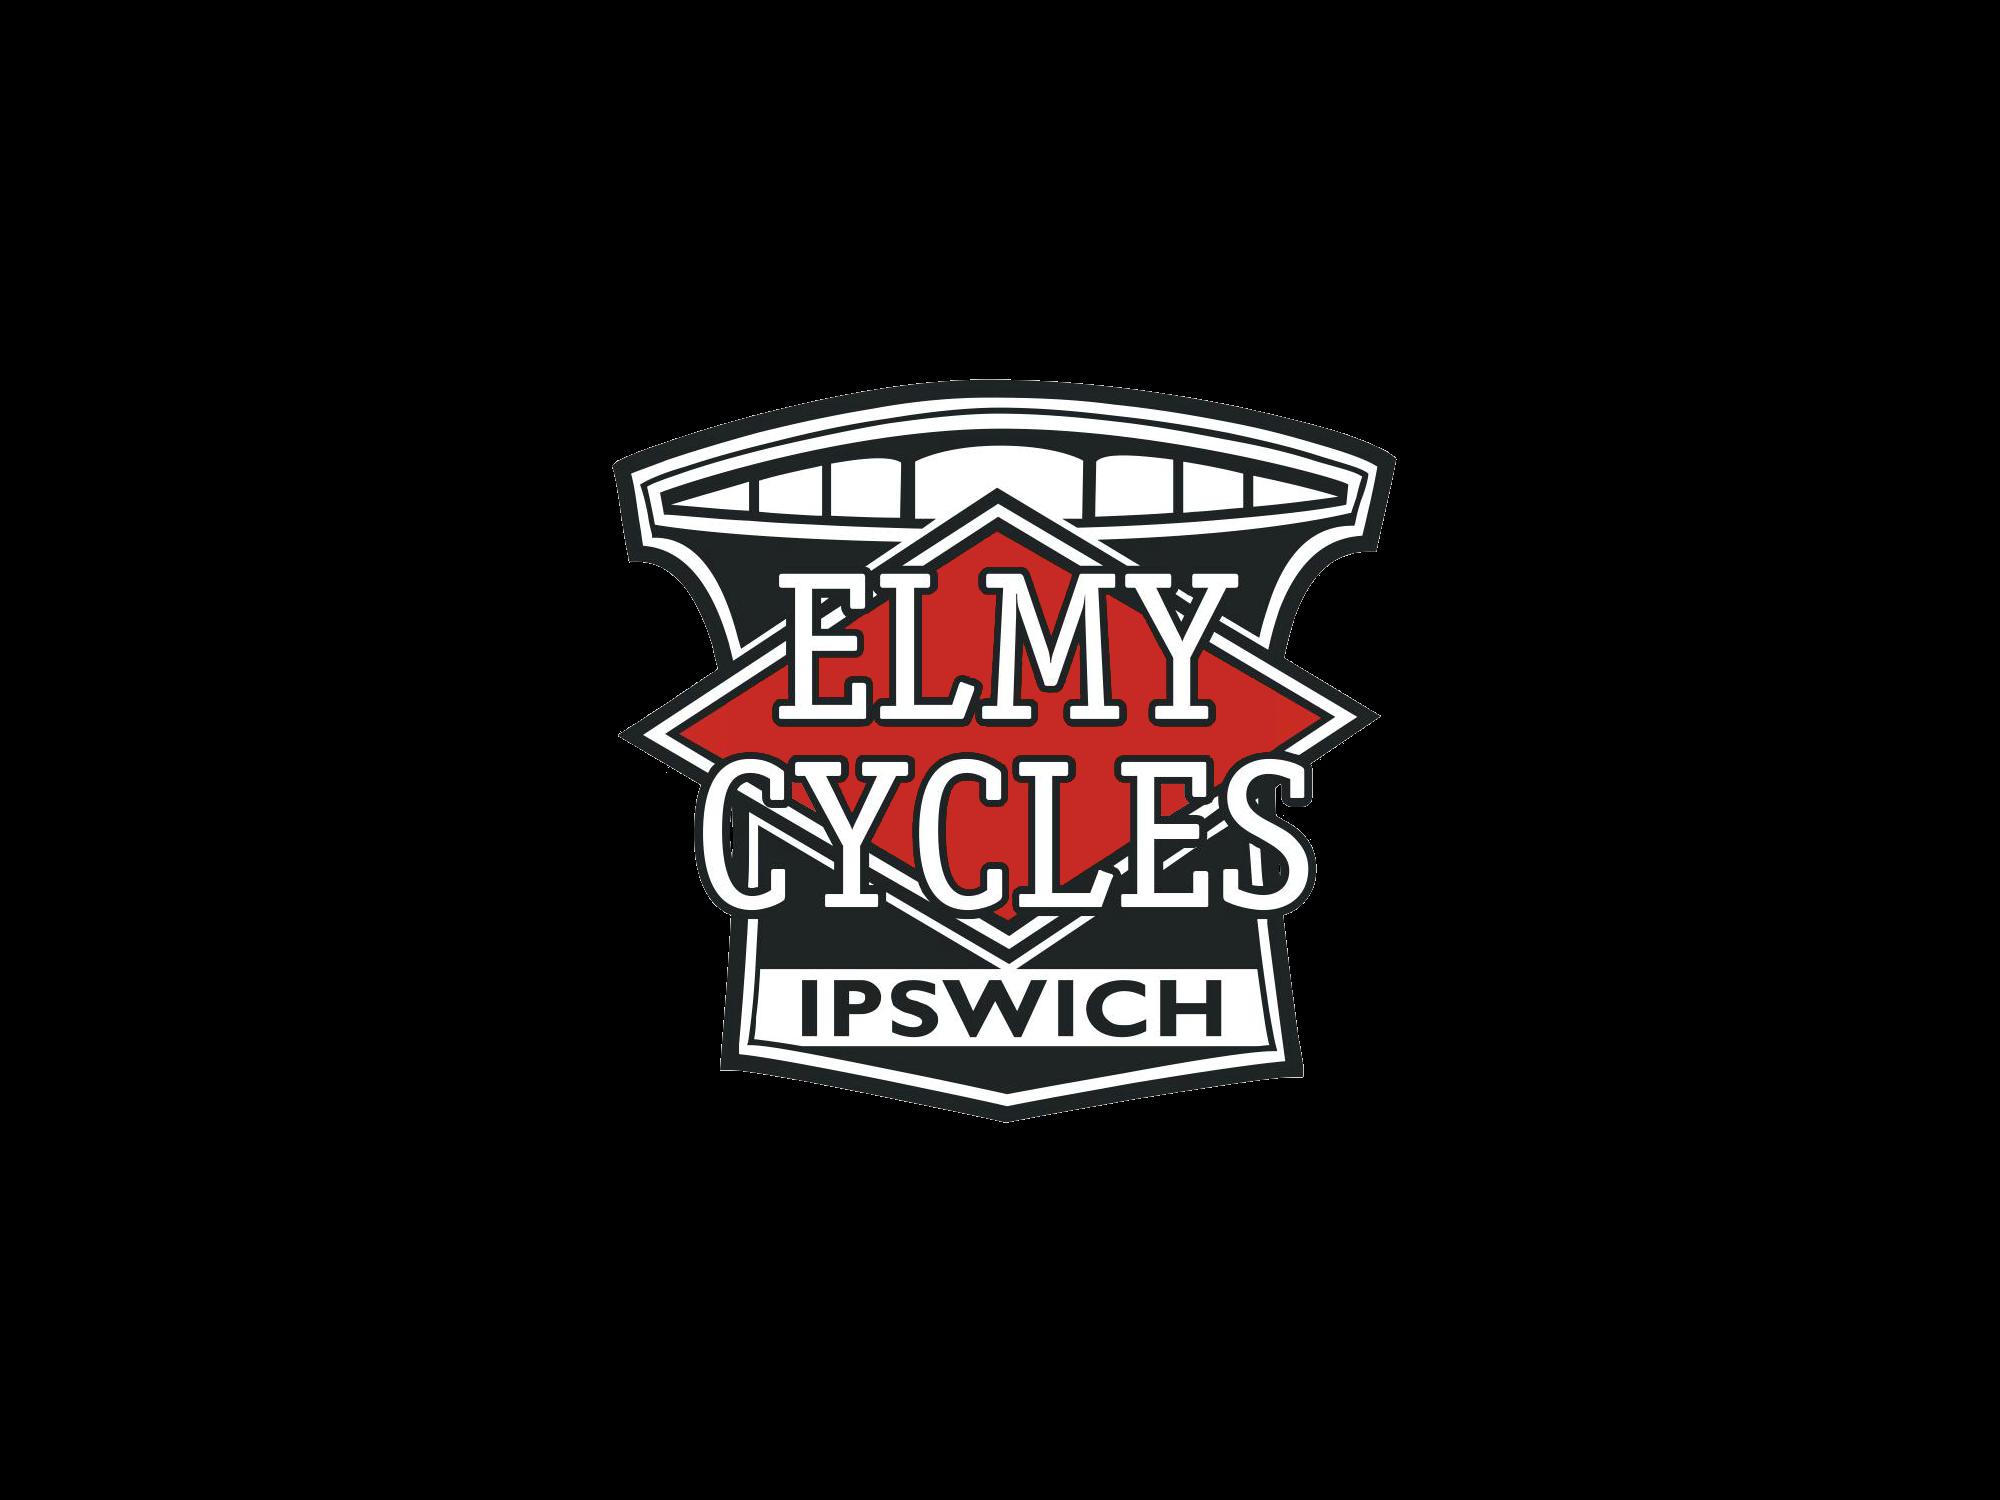 Elmy Cycles Ipswich logo